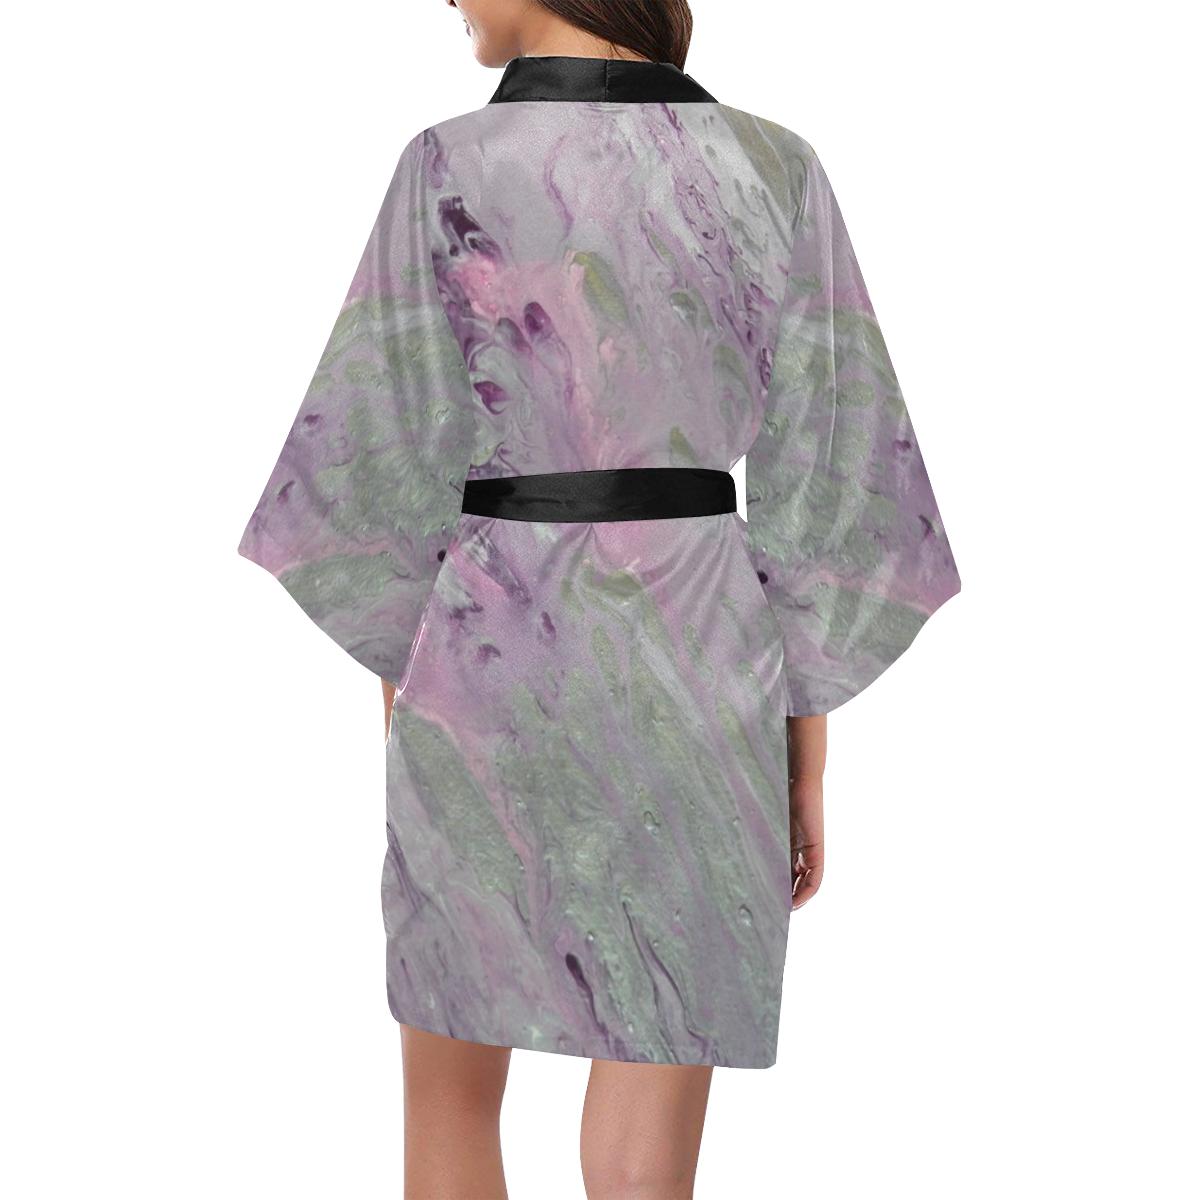 Rose Coloured Star Dust Kimono Robe